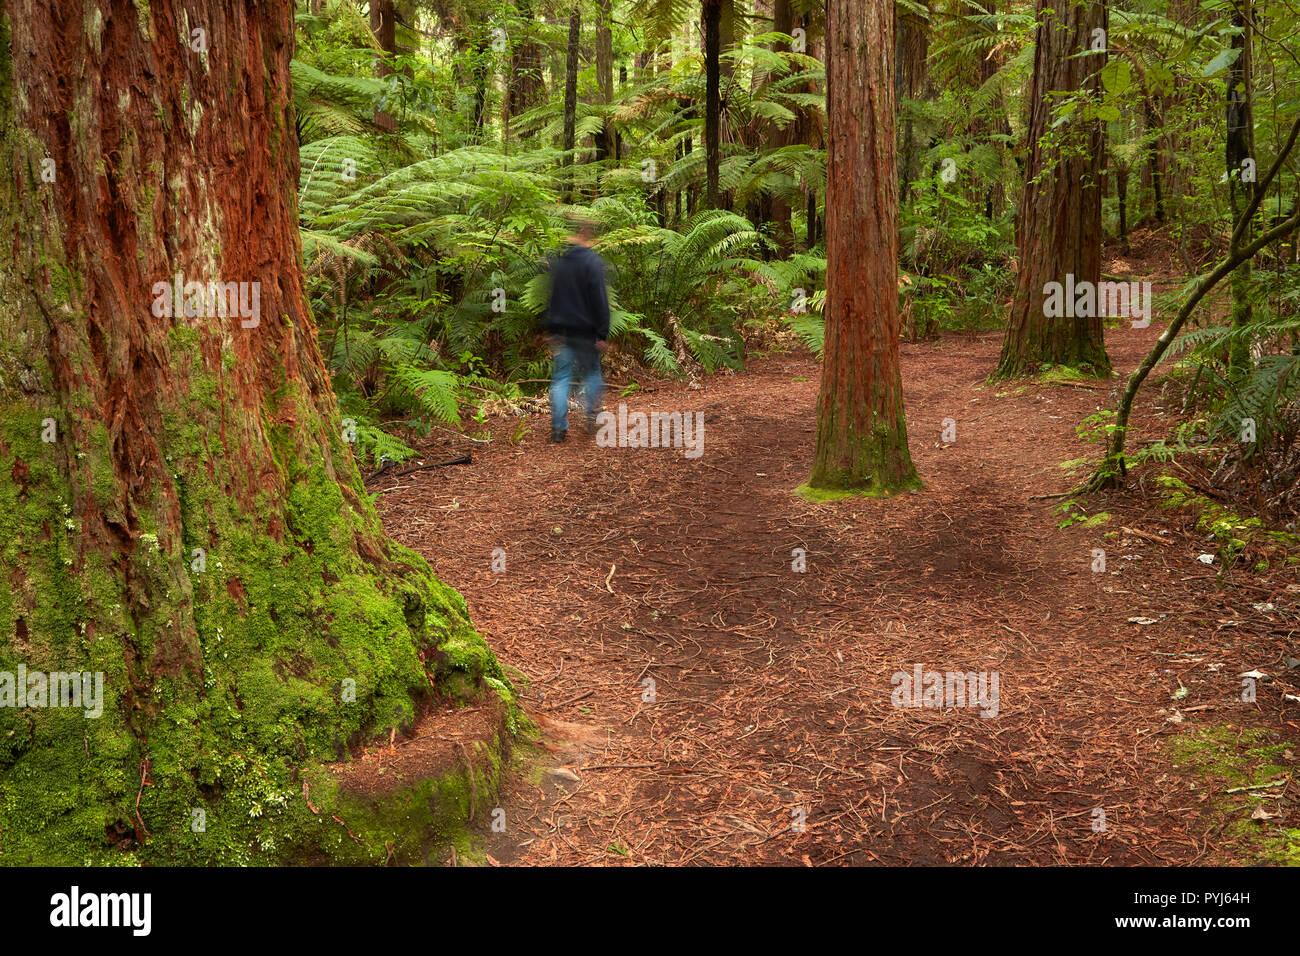 Person on walking track through The Redwoods (Whakarewarewa Forest), Rotorua, North Island, New Zealand (MR) - Stock Image